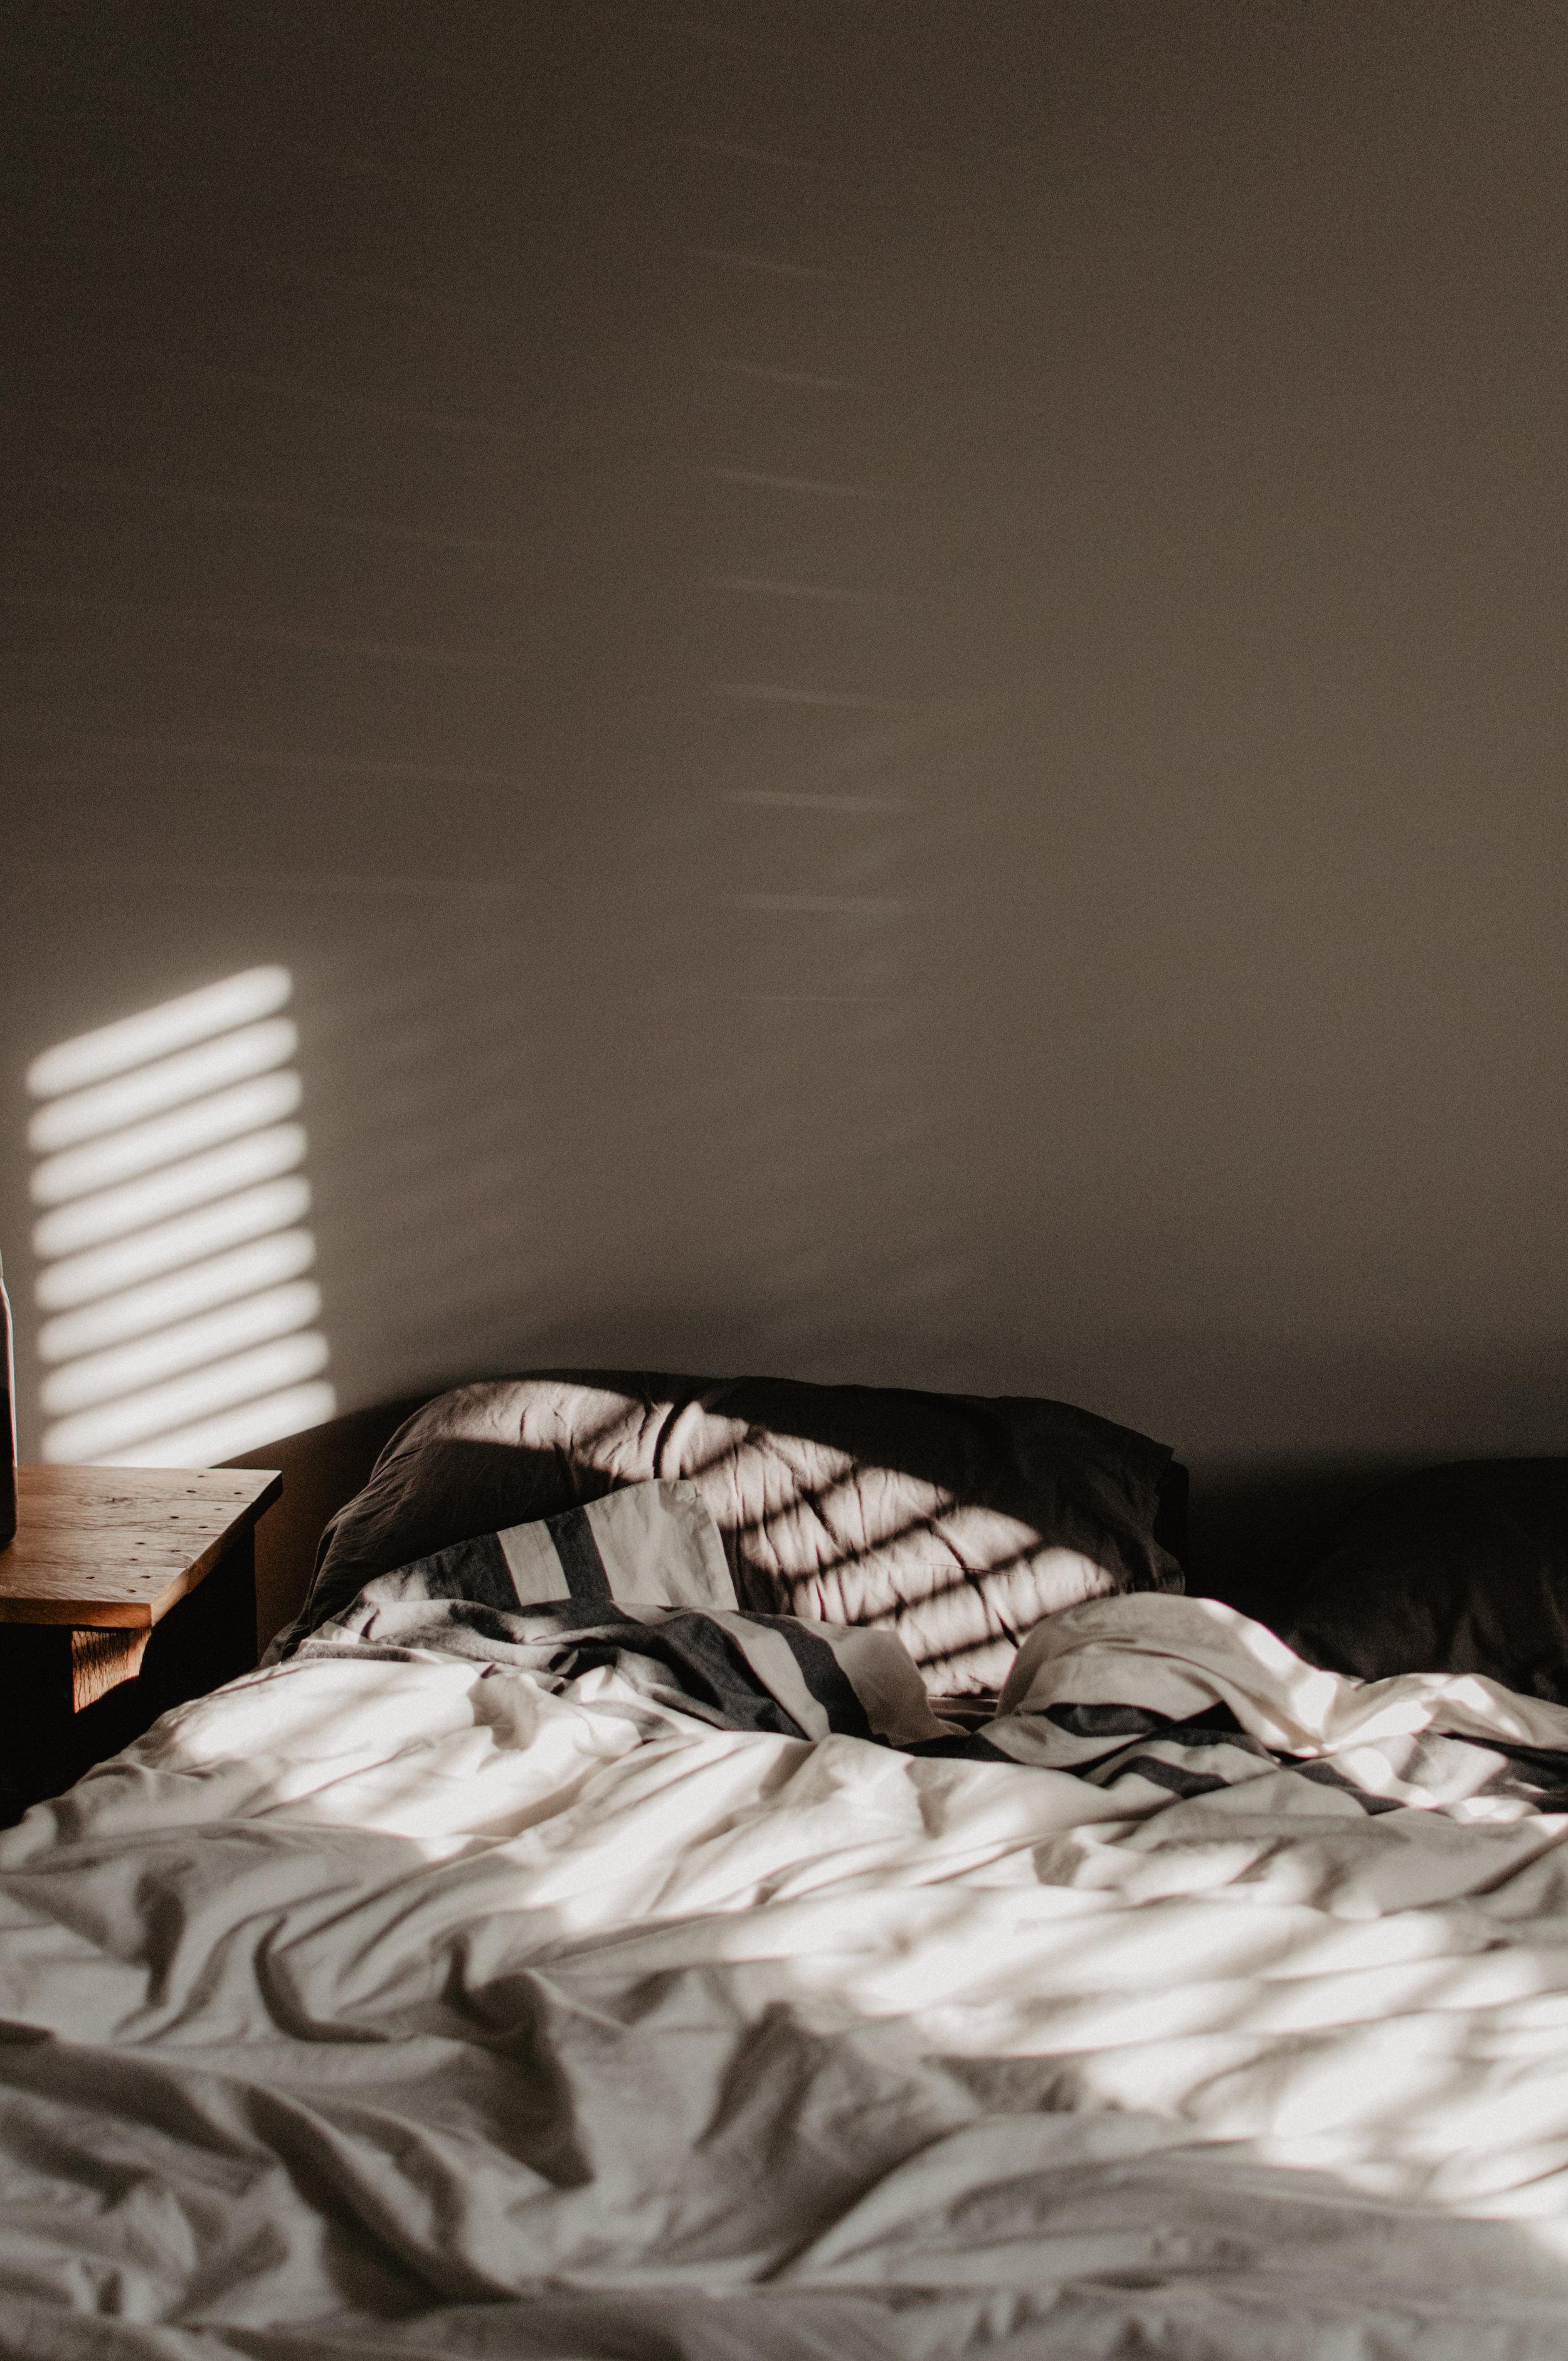 atelier-the-che-how-to-kill-candida-overgrowth-holistic-eat-treatment-holistically-sleep.jpg